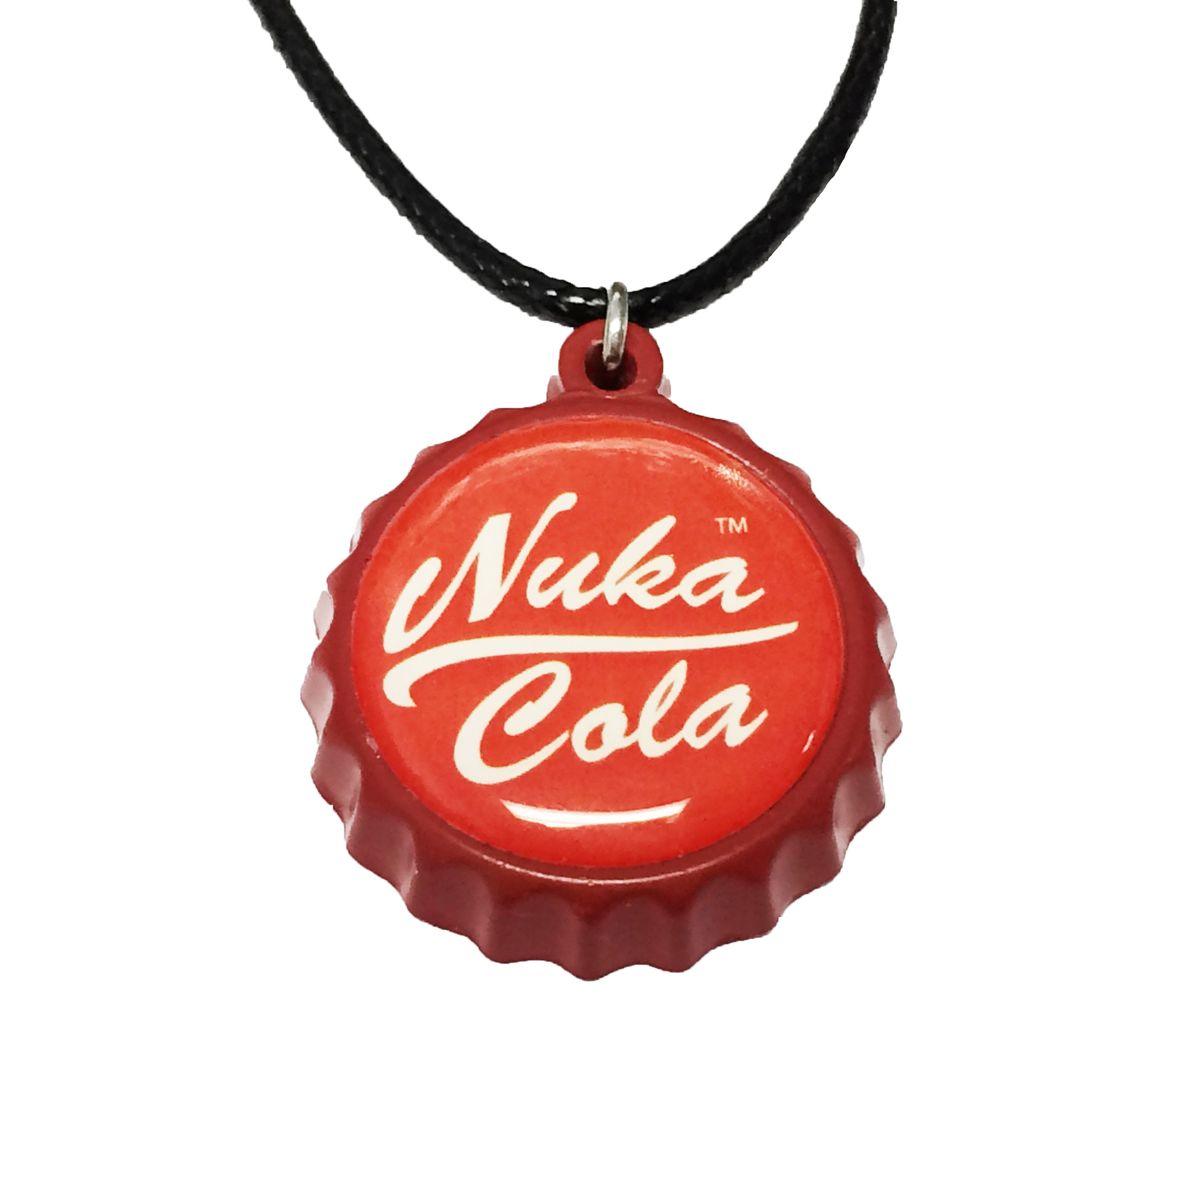 fallout nuka cola bottle cap necklace pinz n thingz